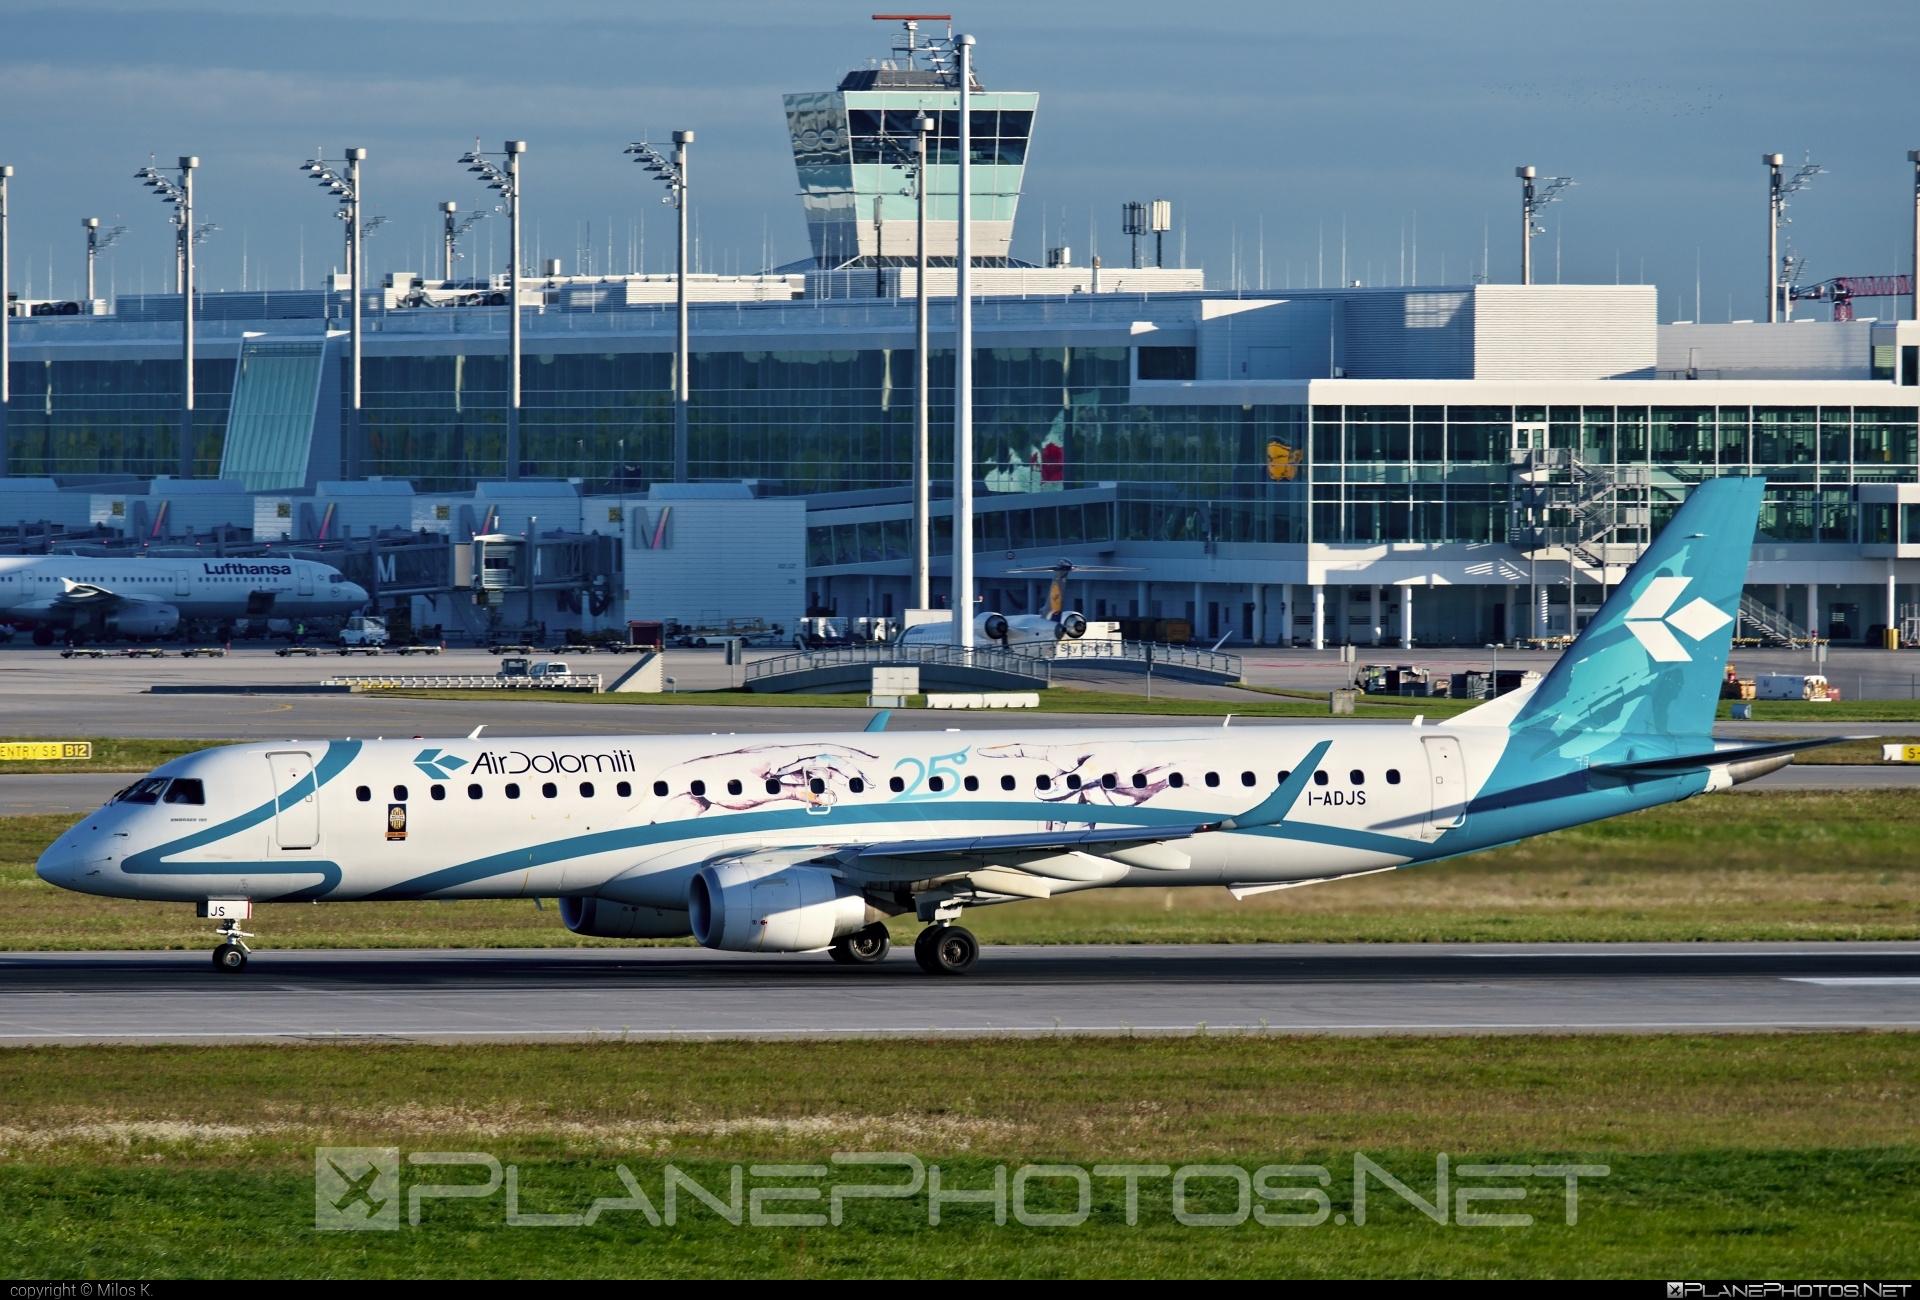 Embraer 190-200LR - I-ADJS operated by Air Dolomiti #airdolomiti #e195 #embraer #embraer195 #embraer195lr